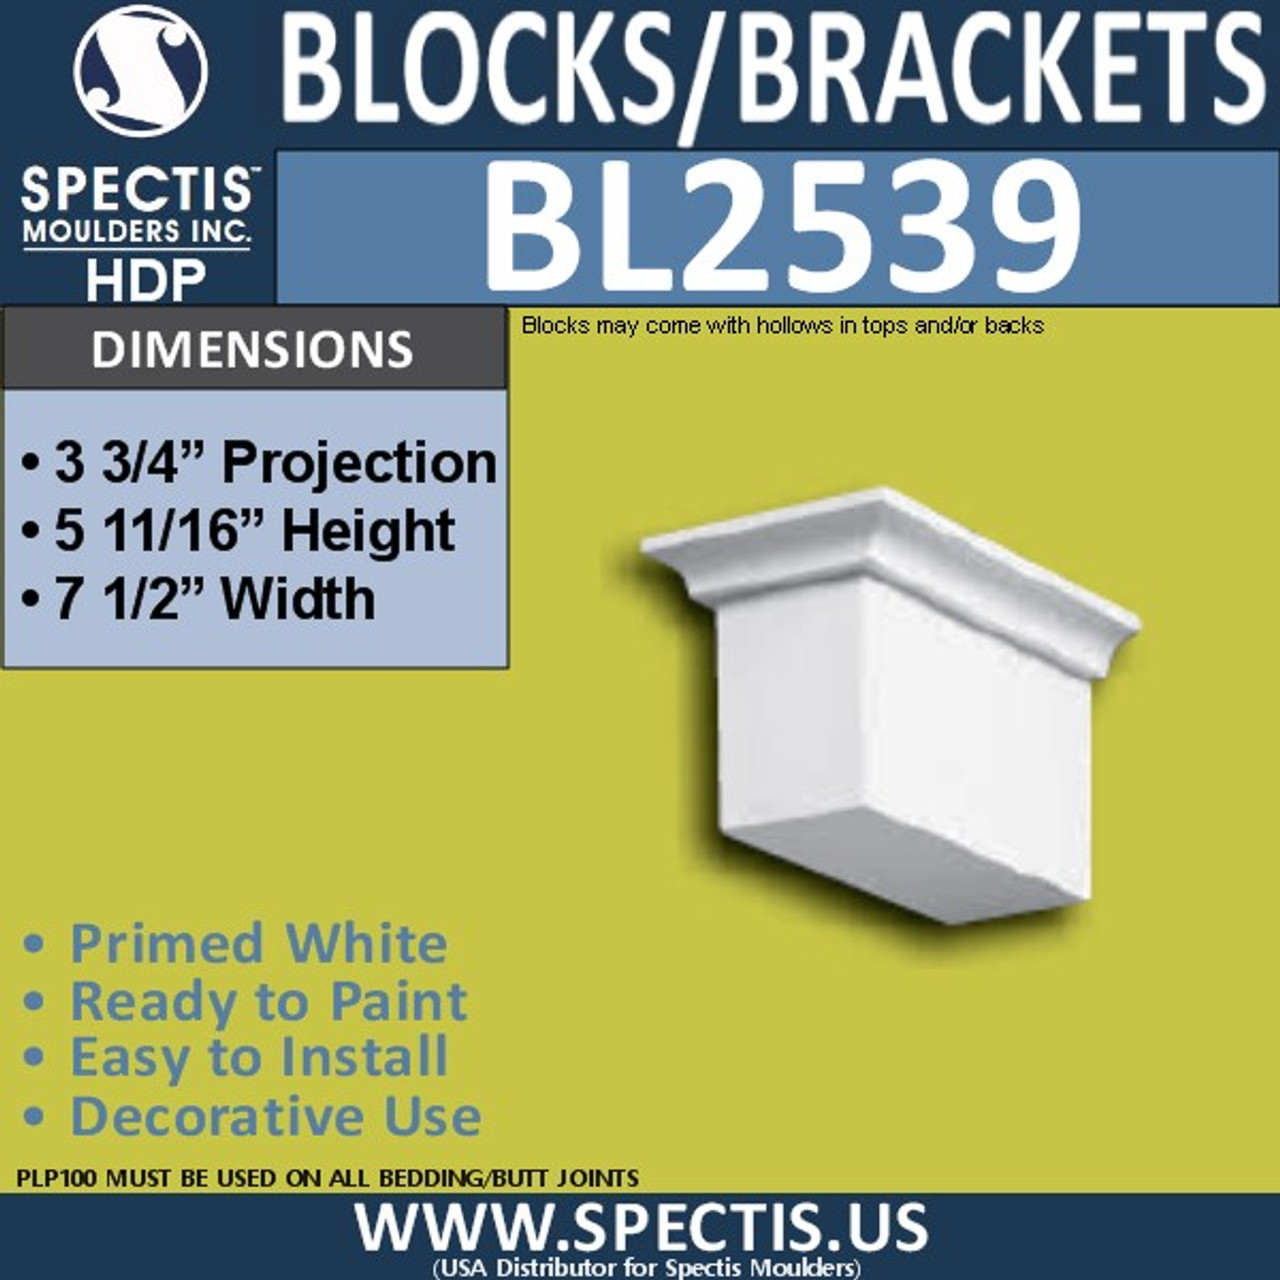 "BL2539 Eave Block or Bracket 7.5""W x 6""H x 3.75"" P"